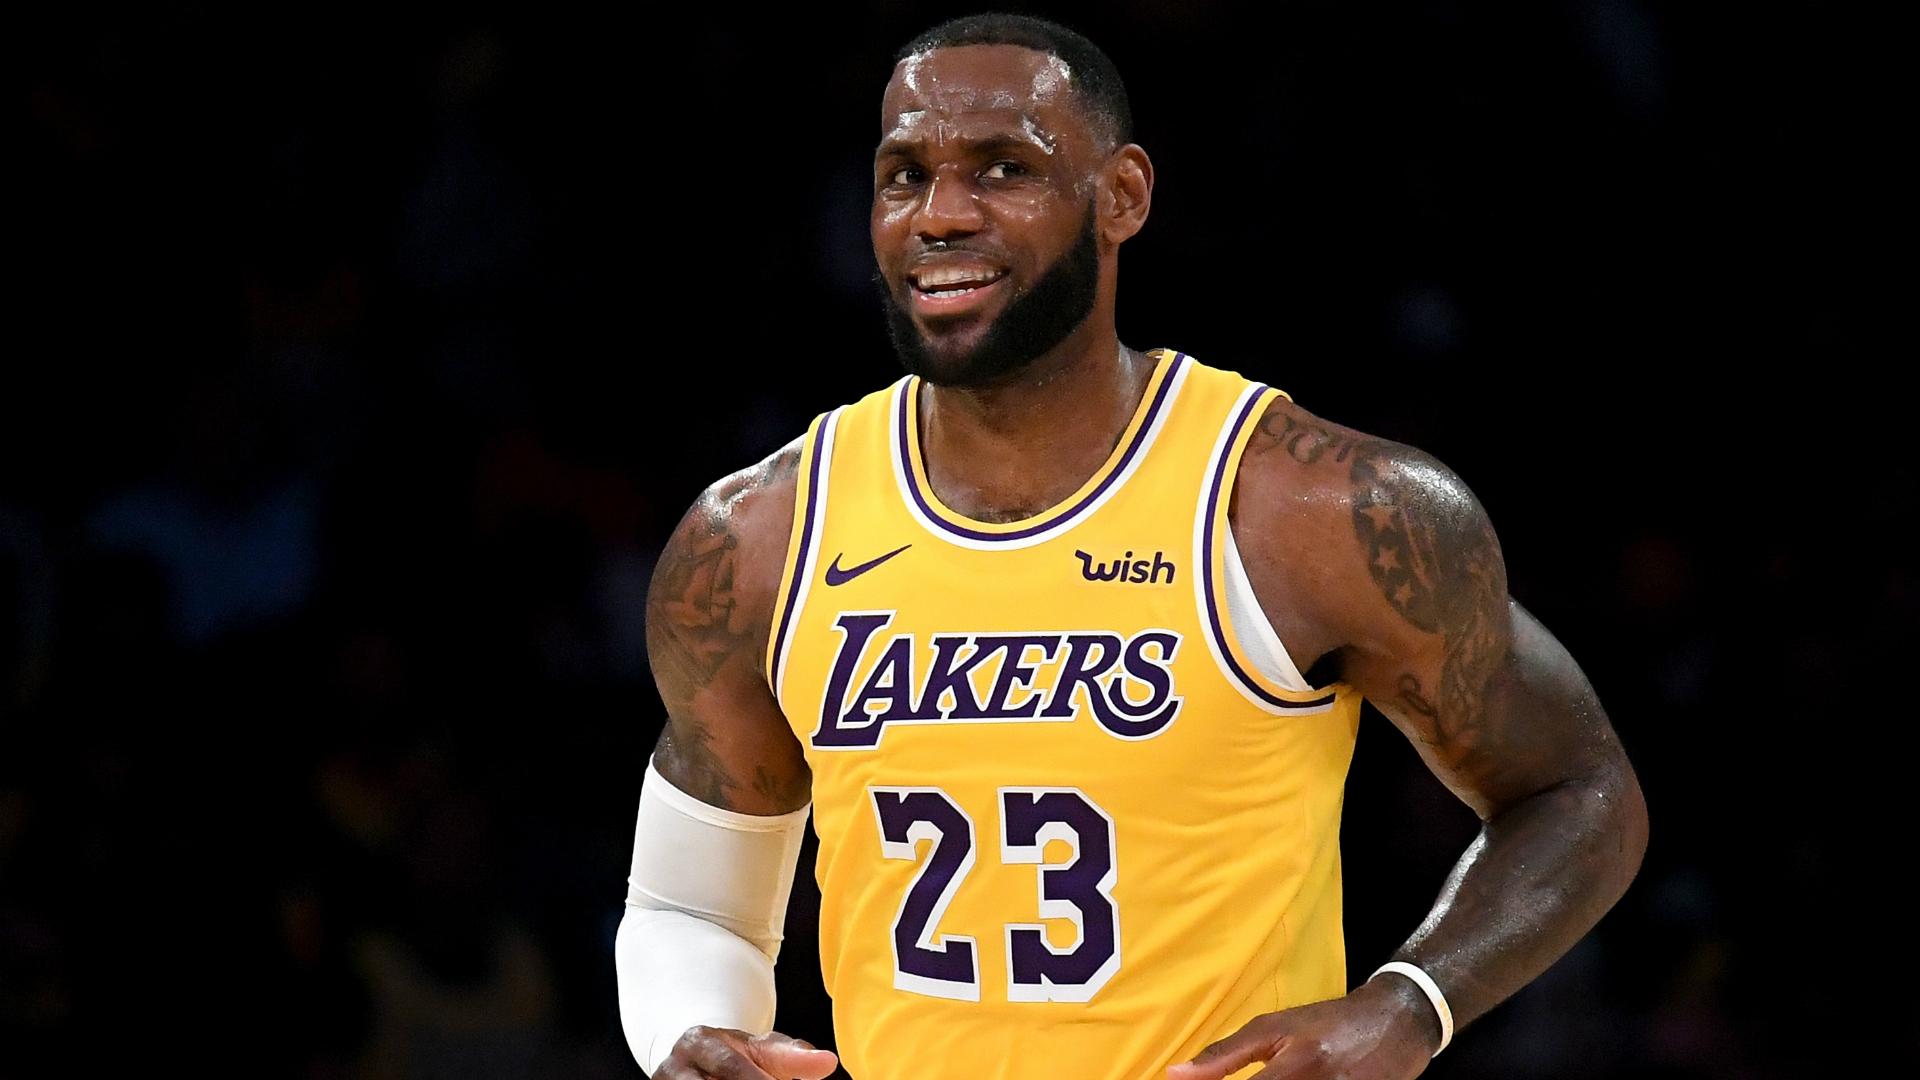 Nike releases inspiring LeBron James ad